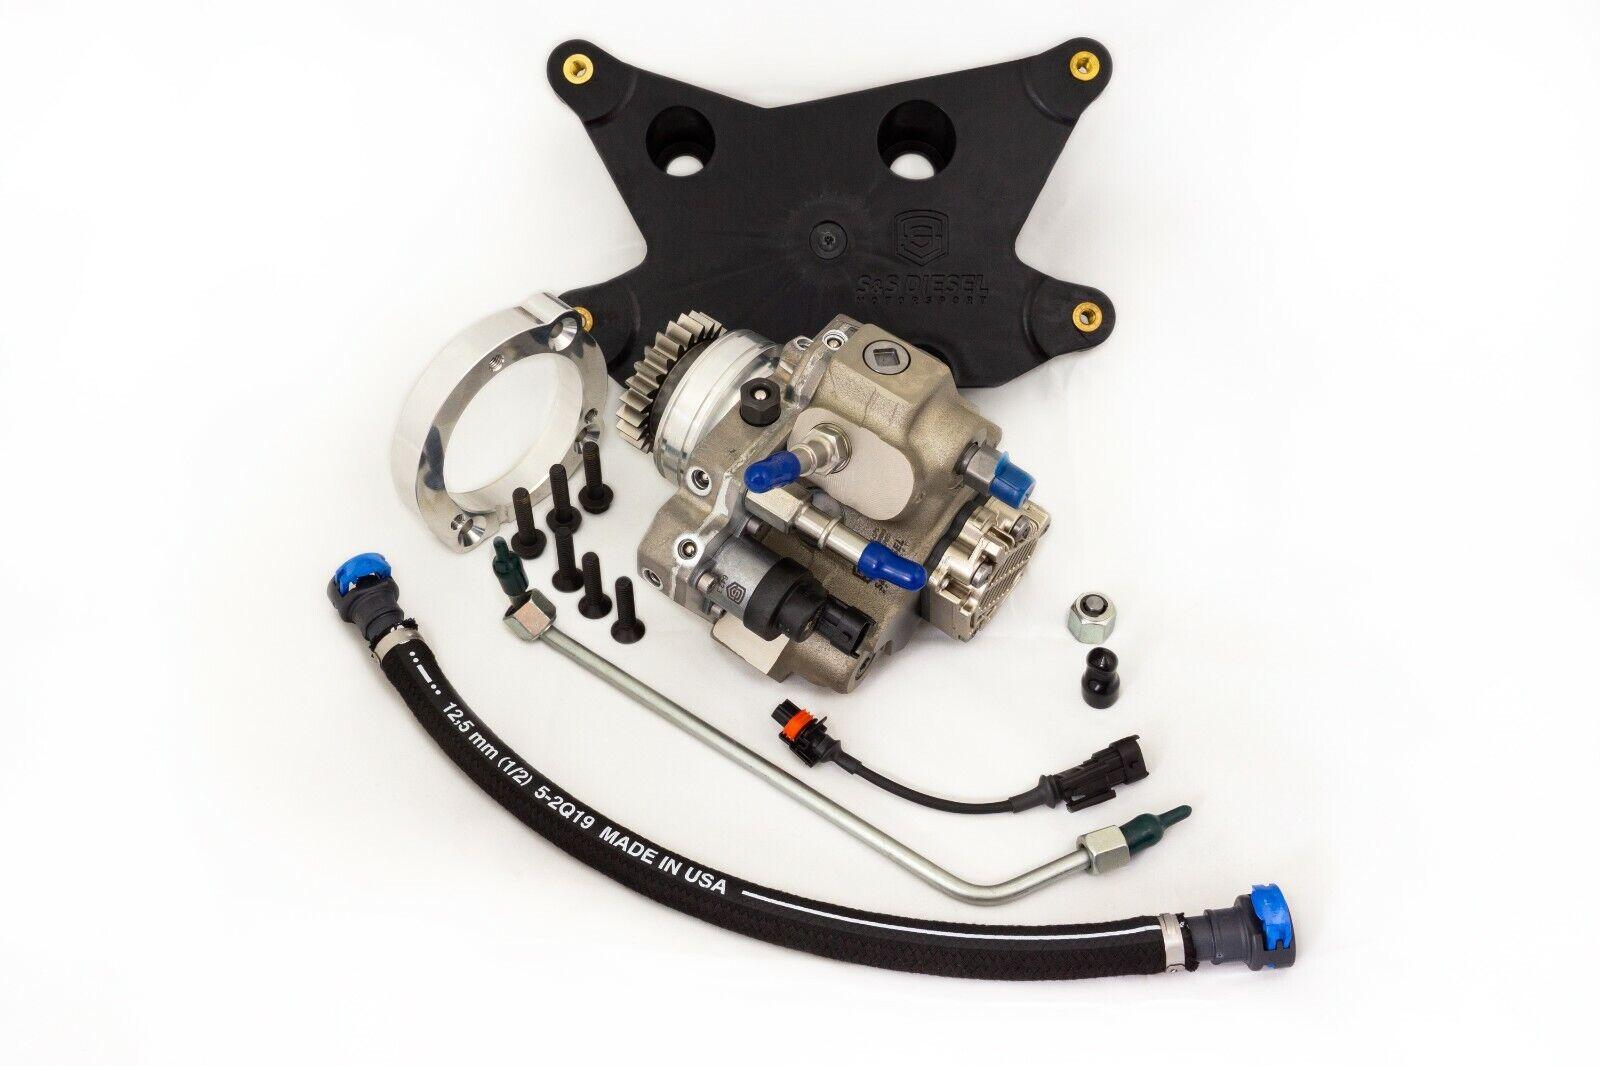 S S Diesel Cp3 Conversion Kit With Pump For 2019 2020 Dodge Ram 6 7l Cummins Ebay